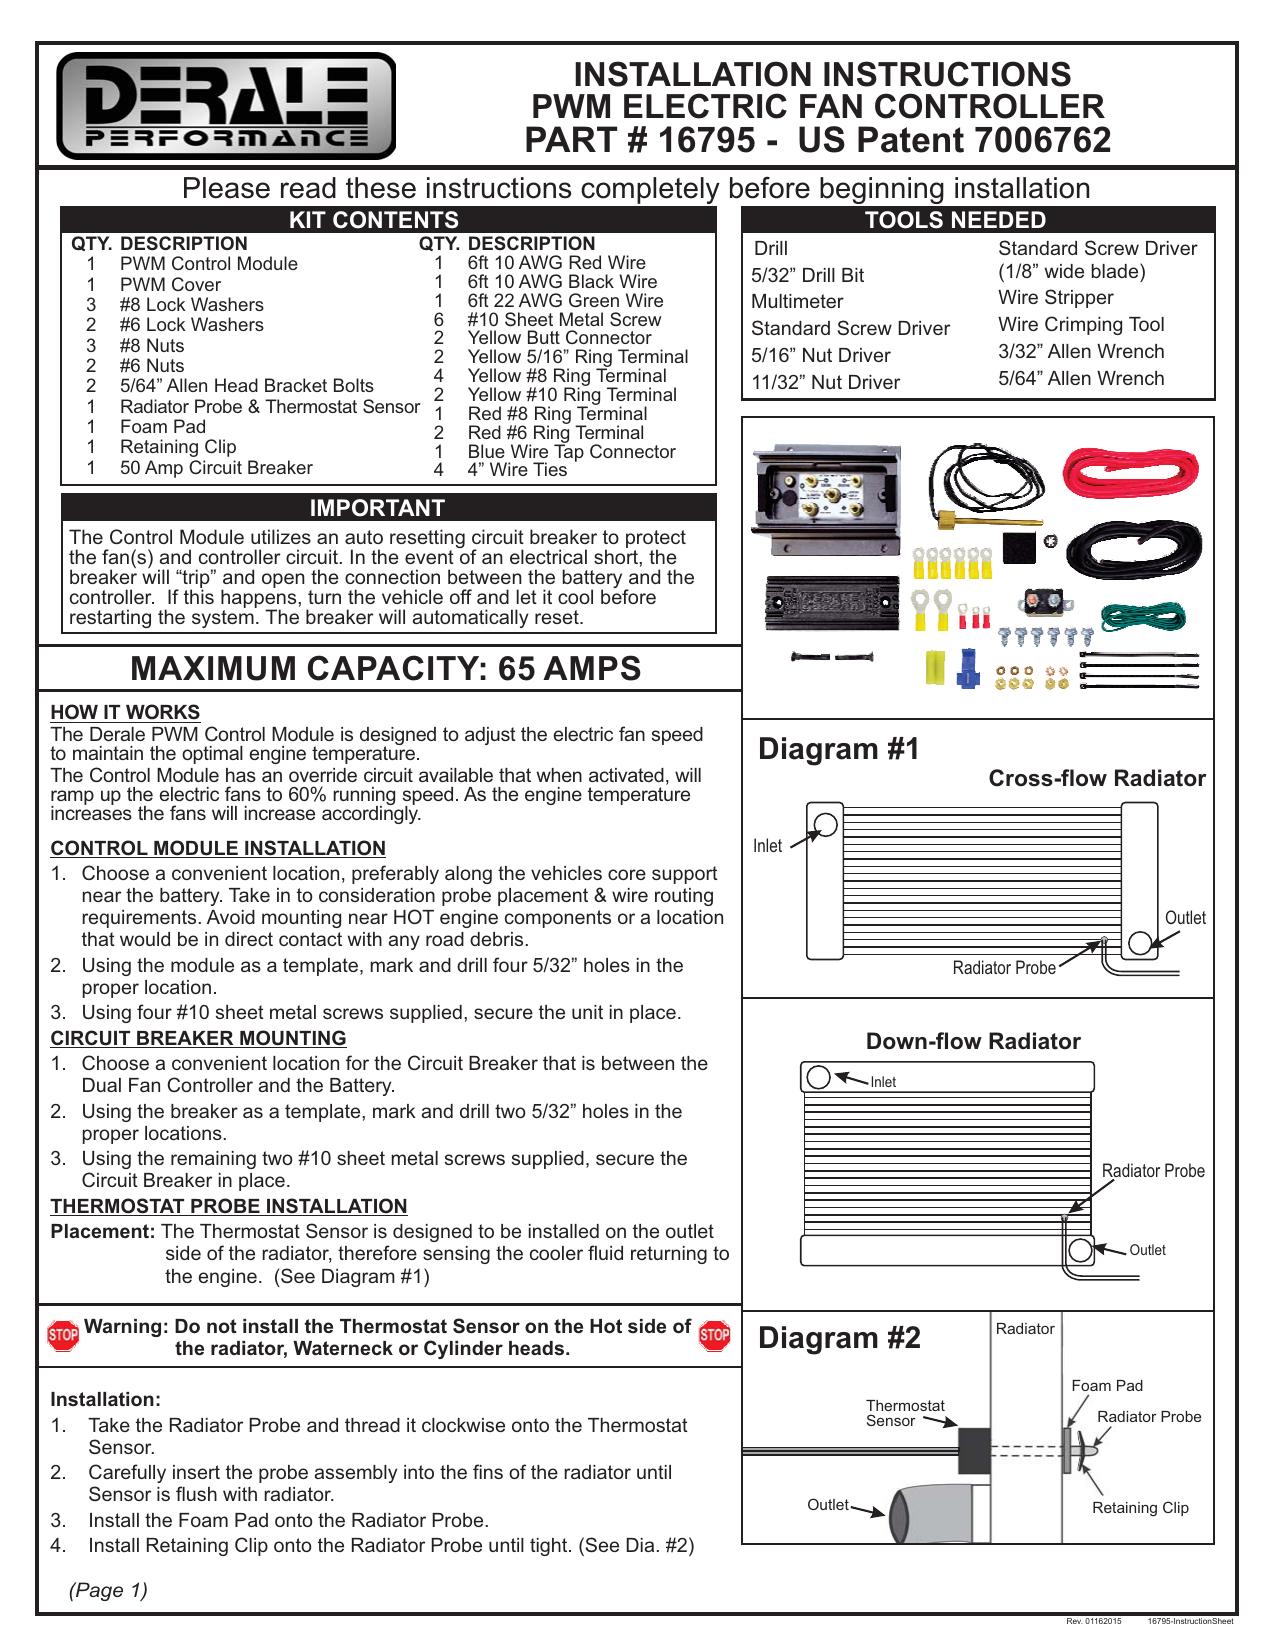 [SCHEMATICS_48EU]  16795 - Derale Performance® Universal PWM Fan Controller | Manualzz | Derale Fan Controller Wiring Diagram |  | manualzz